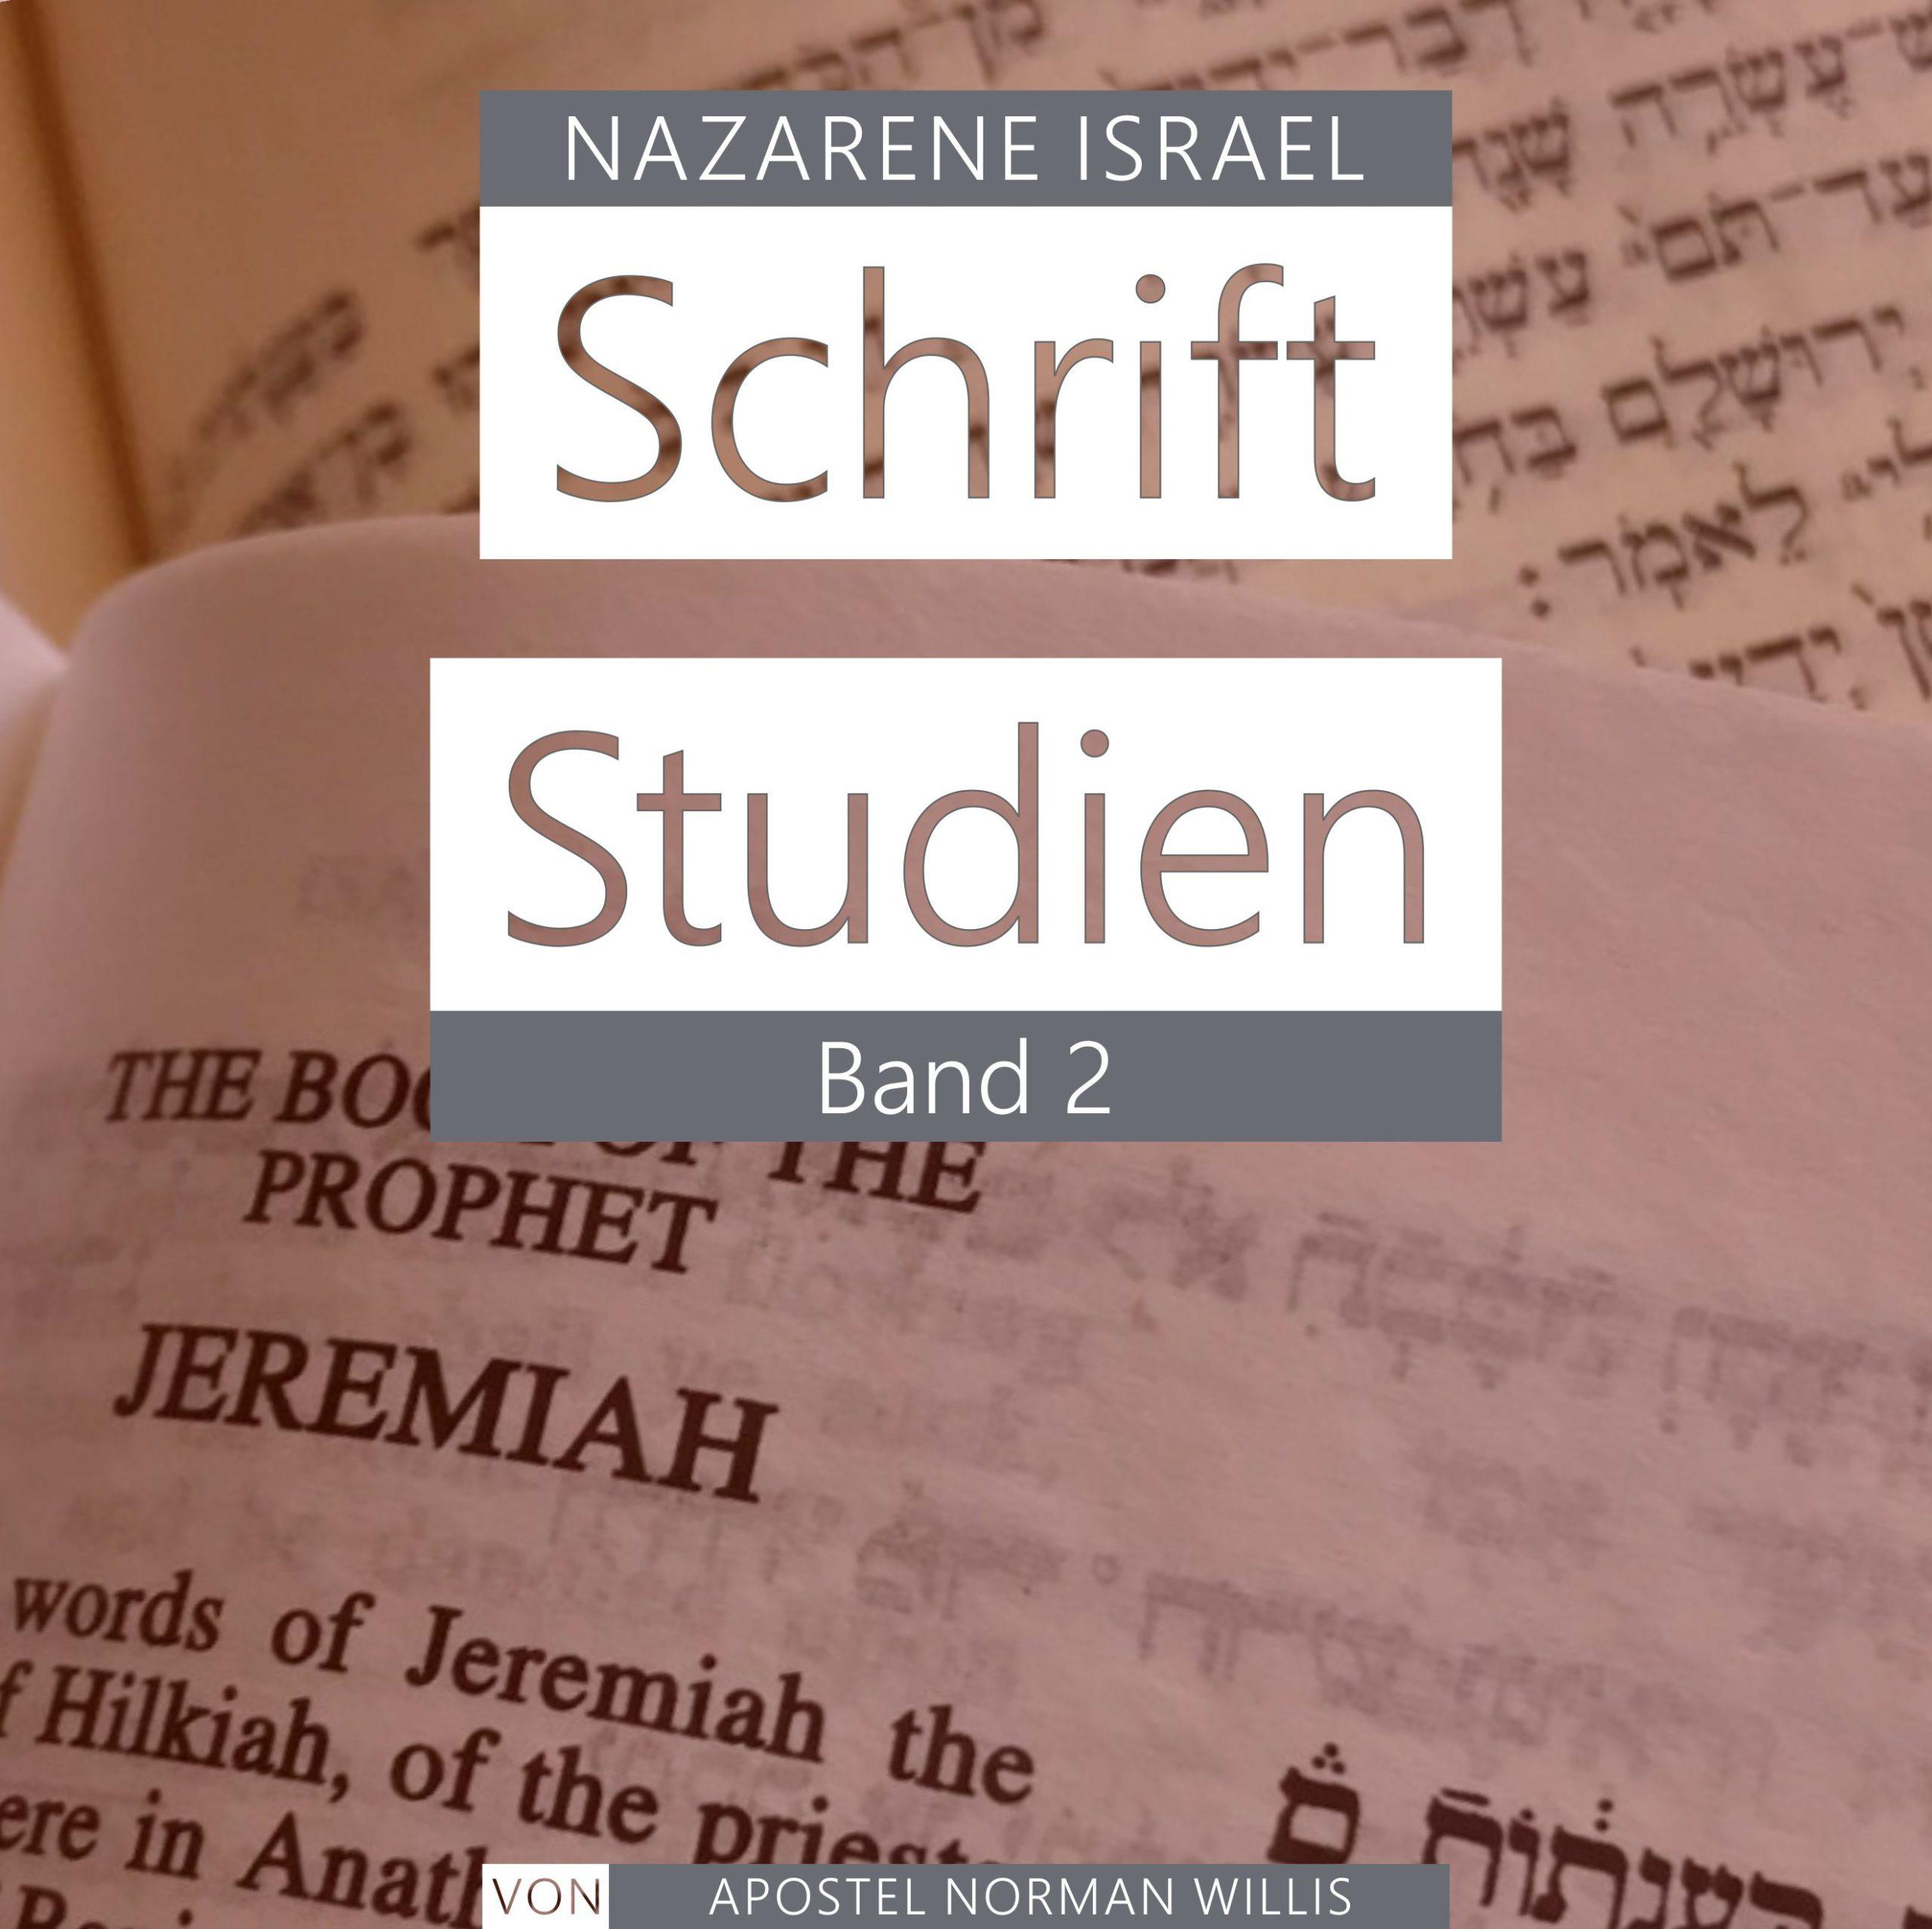 Nazarene Schrift Studien Band 2